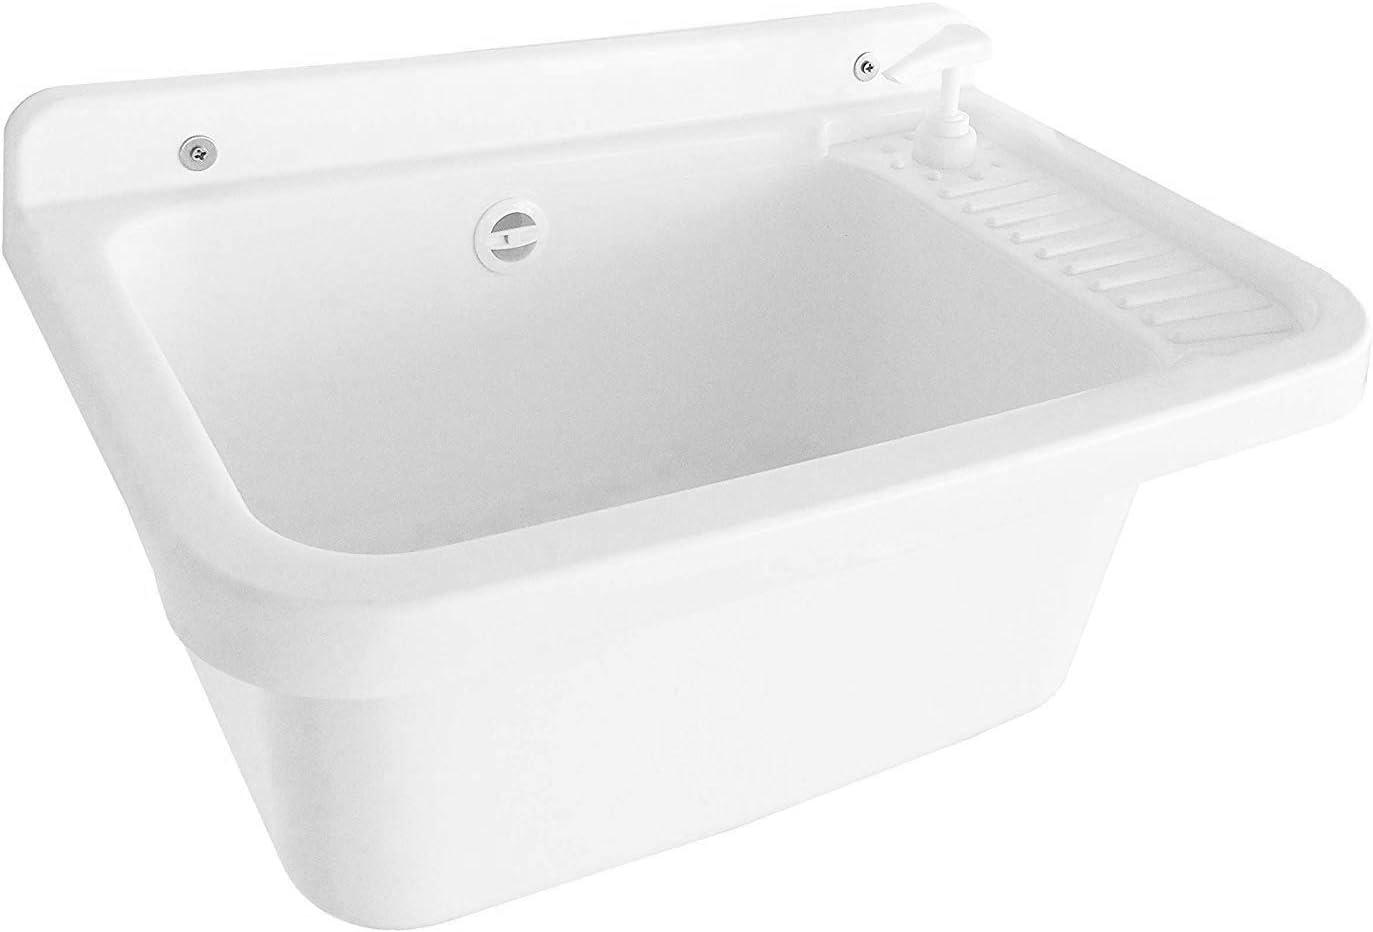 Adventa - Lavabo de Pared con dispensador de jabón, de Resina de Exterior, Color Blanco, 59 x 39 x 28 cm